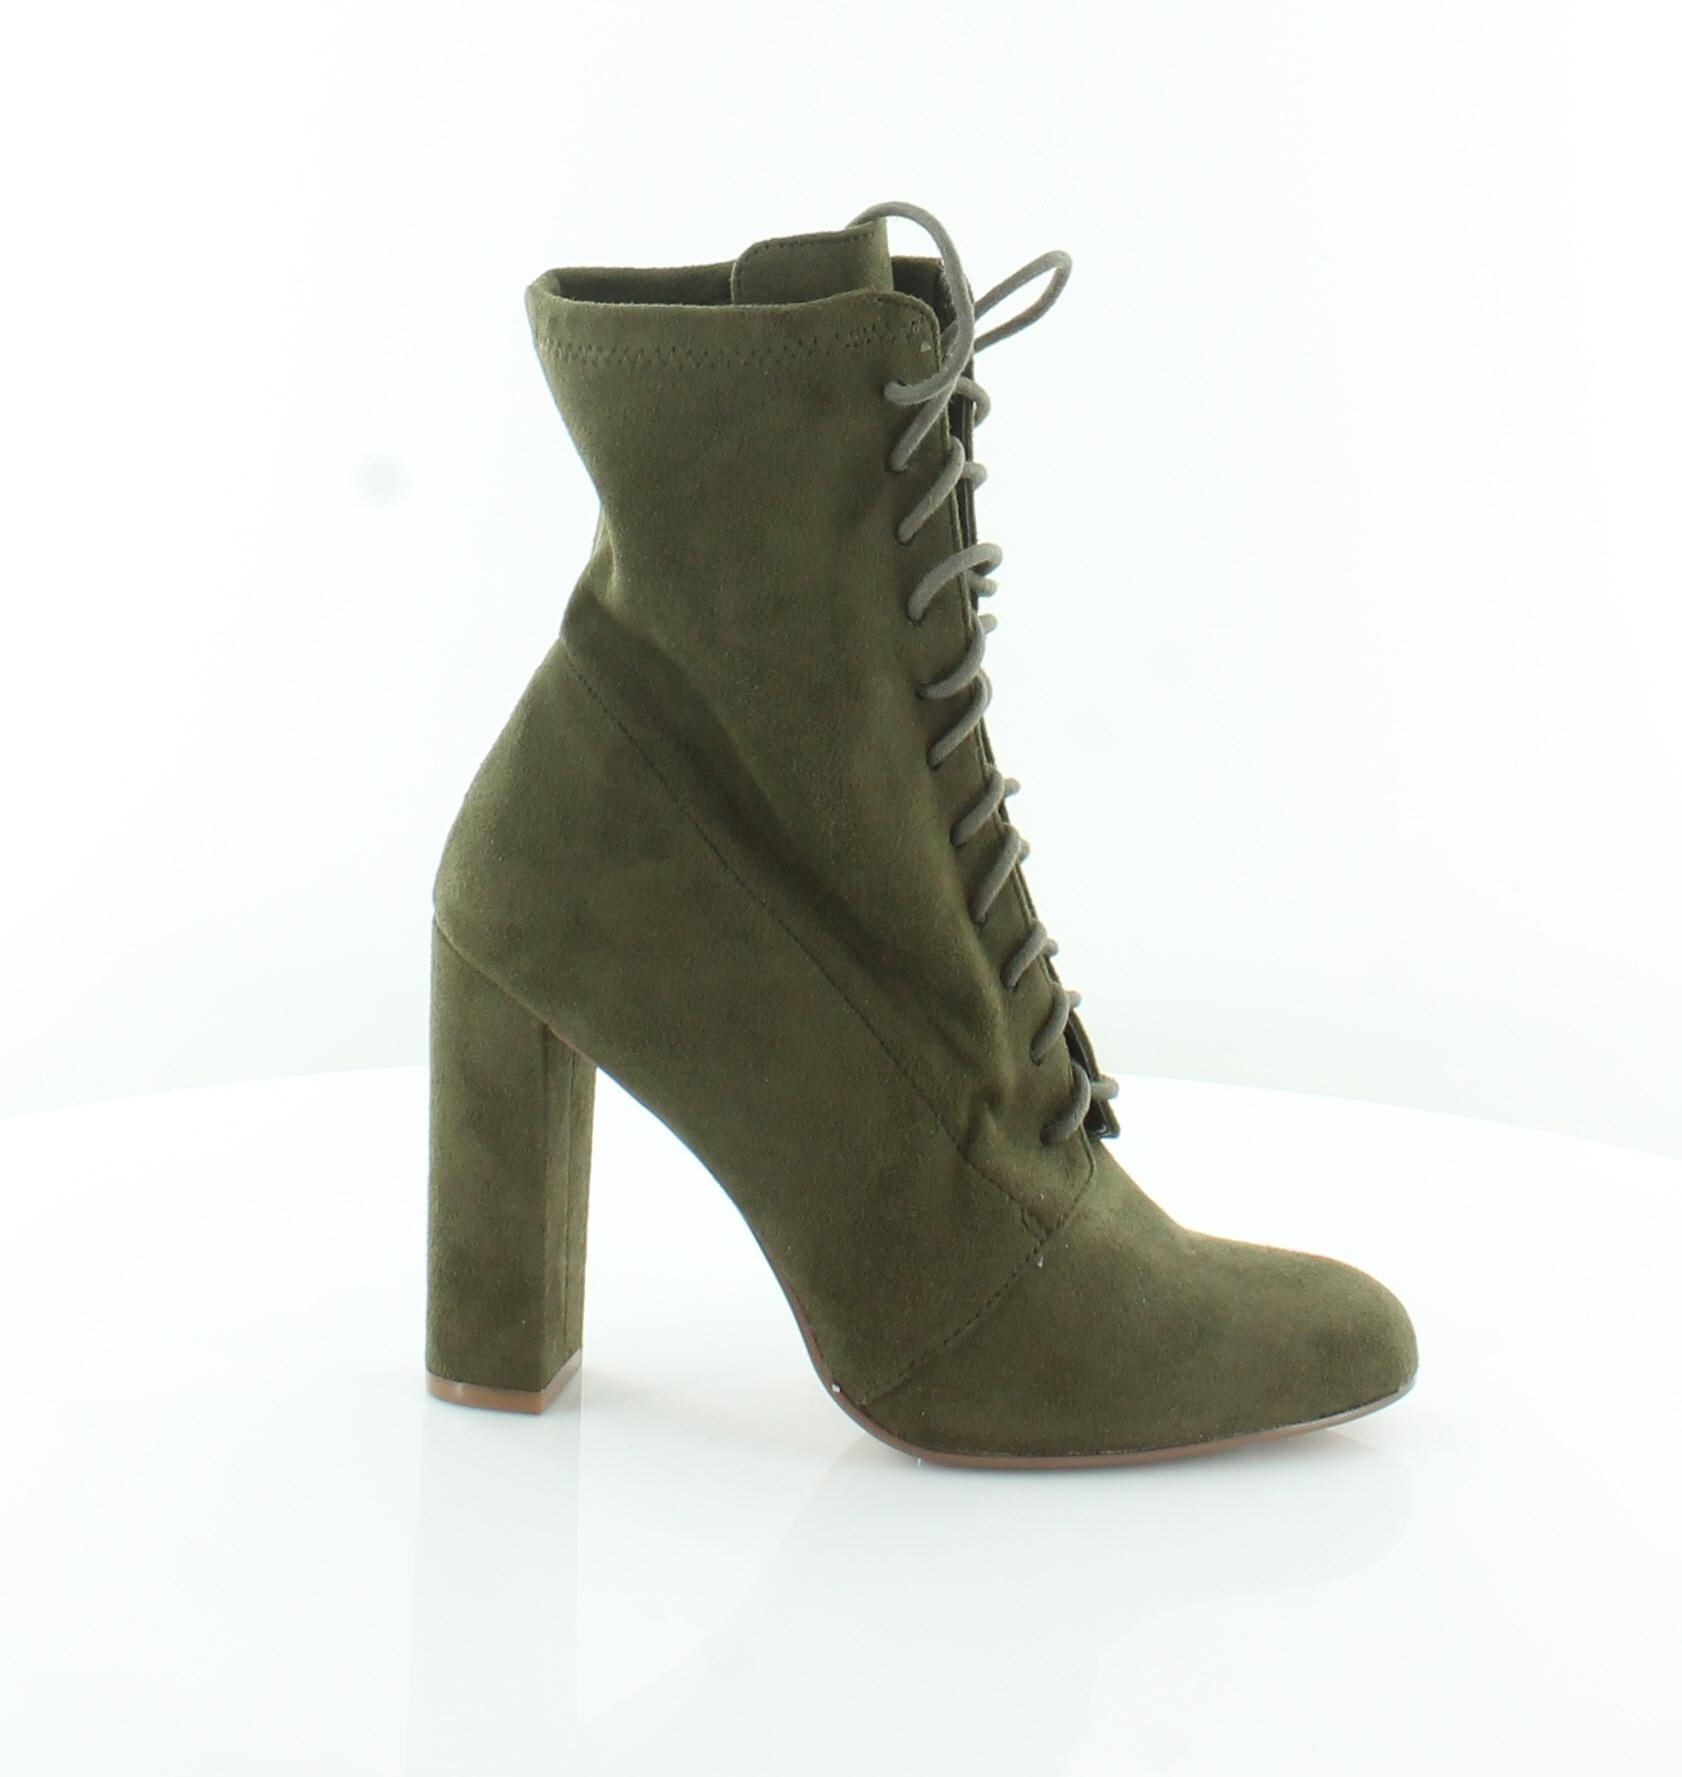 970973579e7 Steve Madden Elley Green Womens Shoes Size 5.5 M Boots MSRP  99 ...